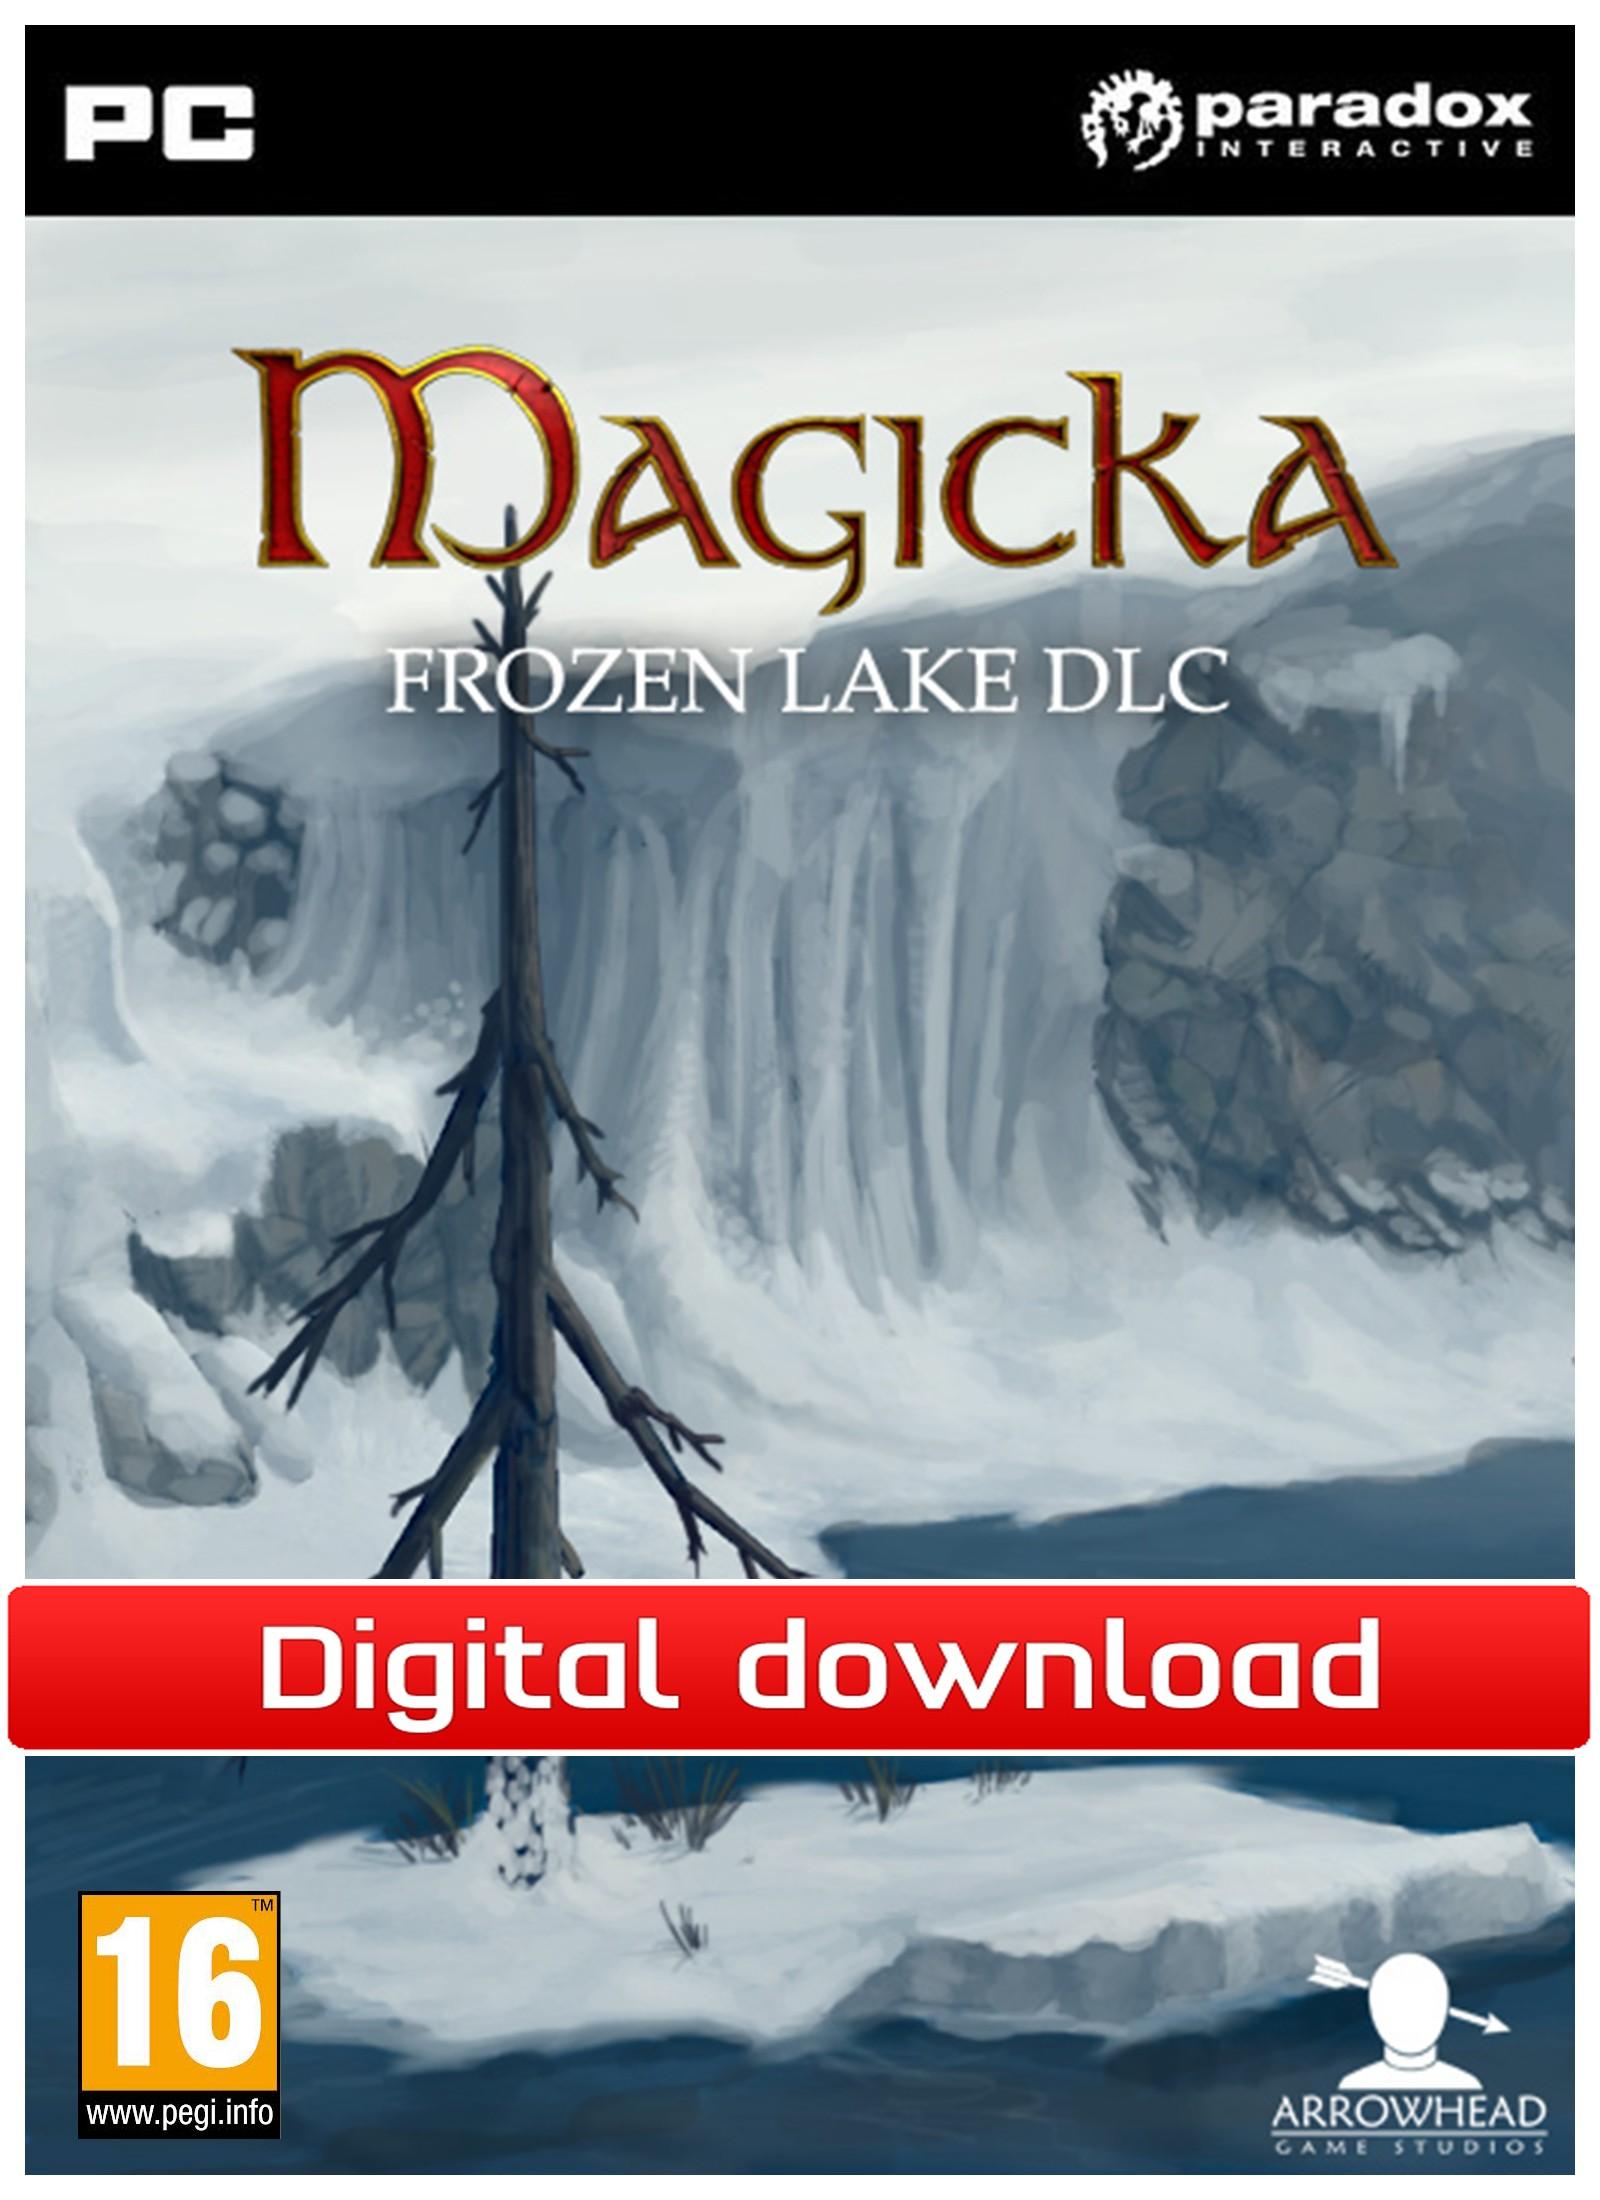 Magicka: DLC Frozen Lake (PC nedlastning) PCDD27082